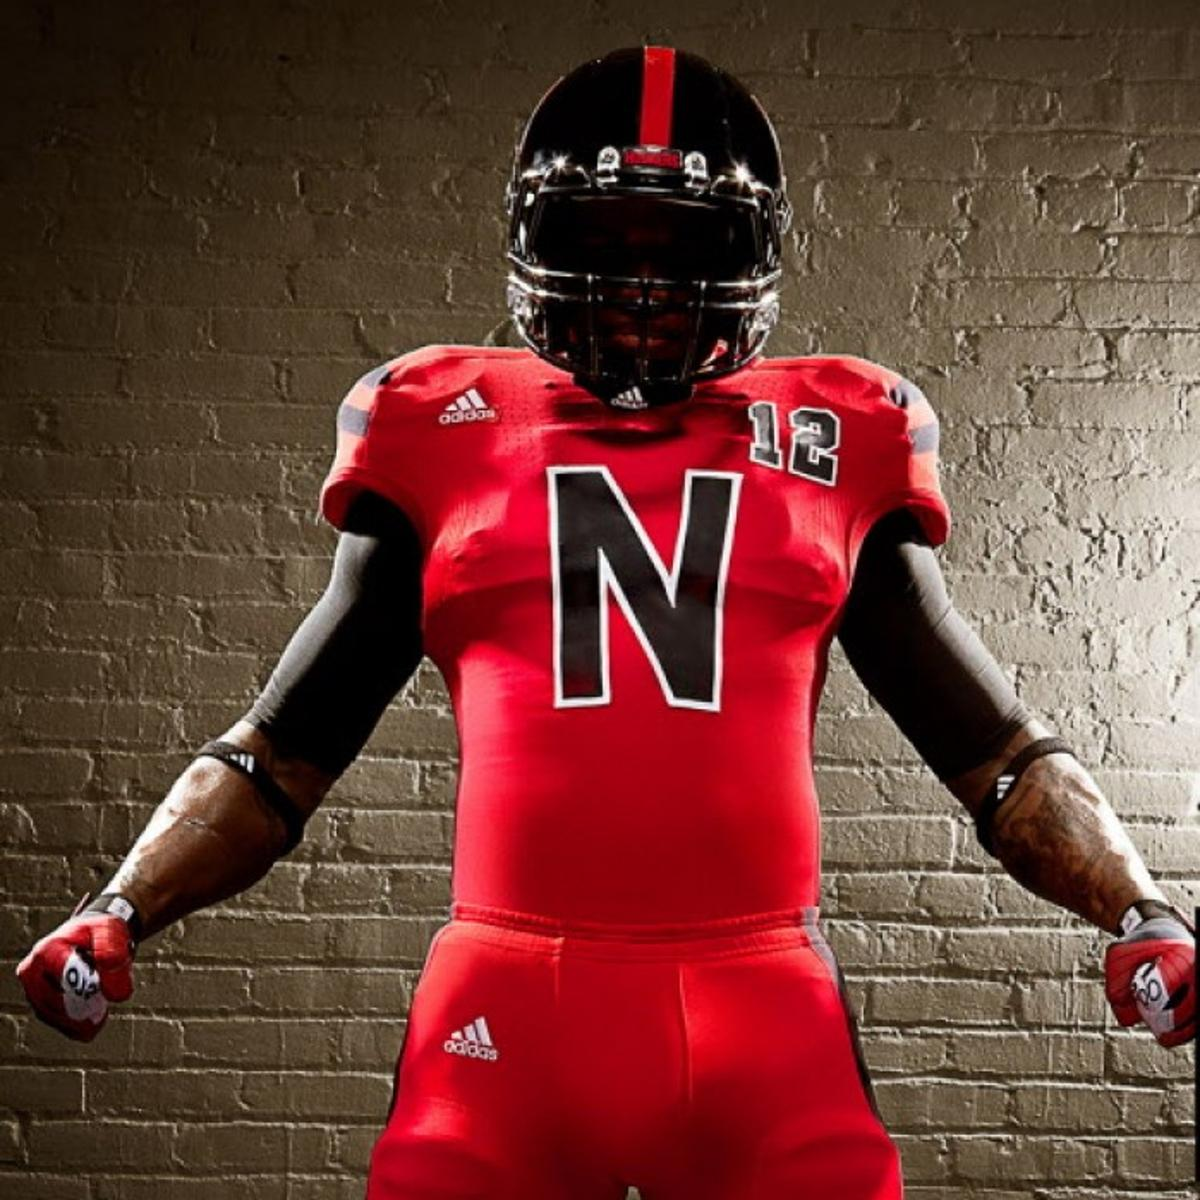 finest selection 5b861 7d8c2 After leak, Nebraska unveils alternate uniforms | Football ...